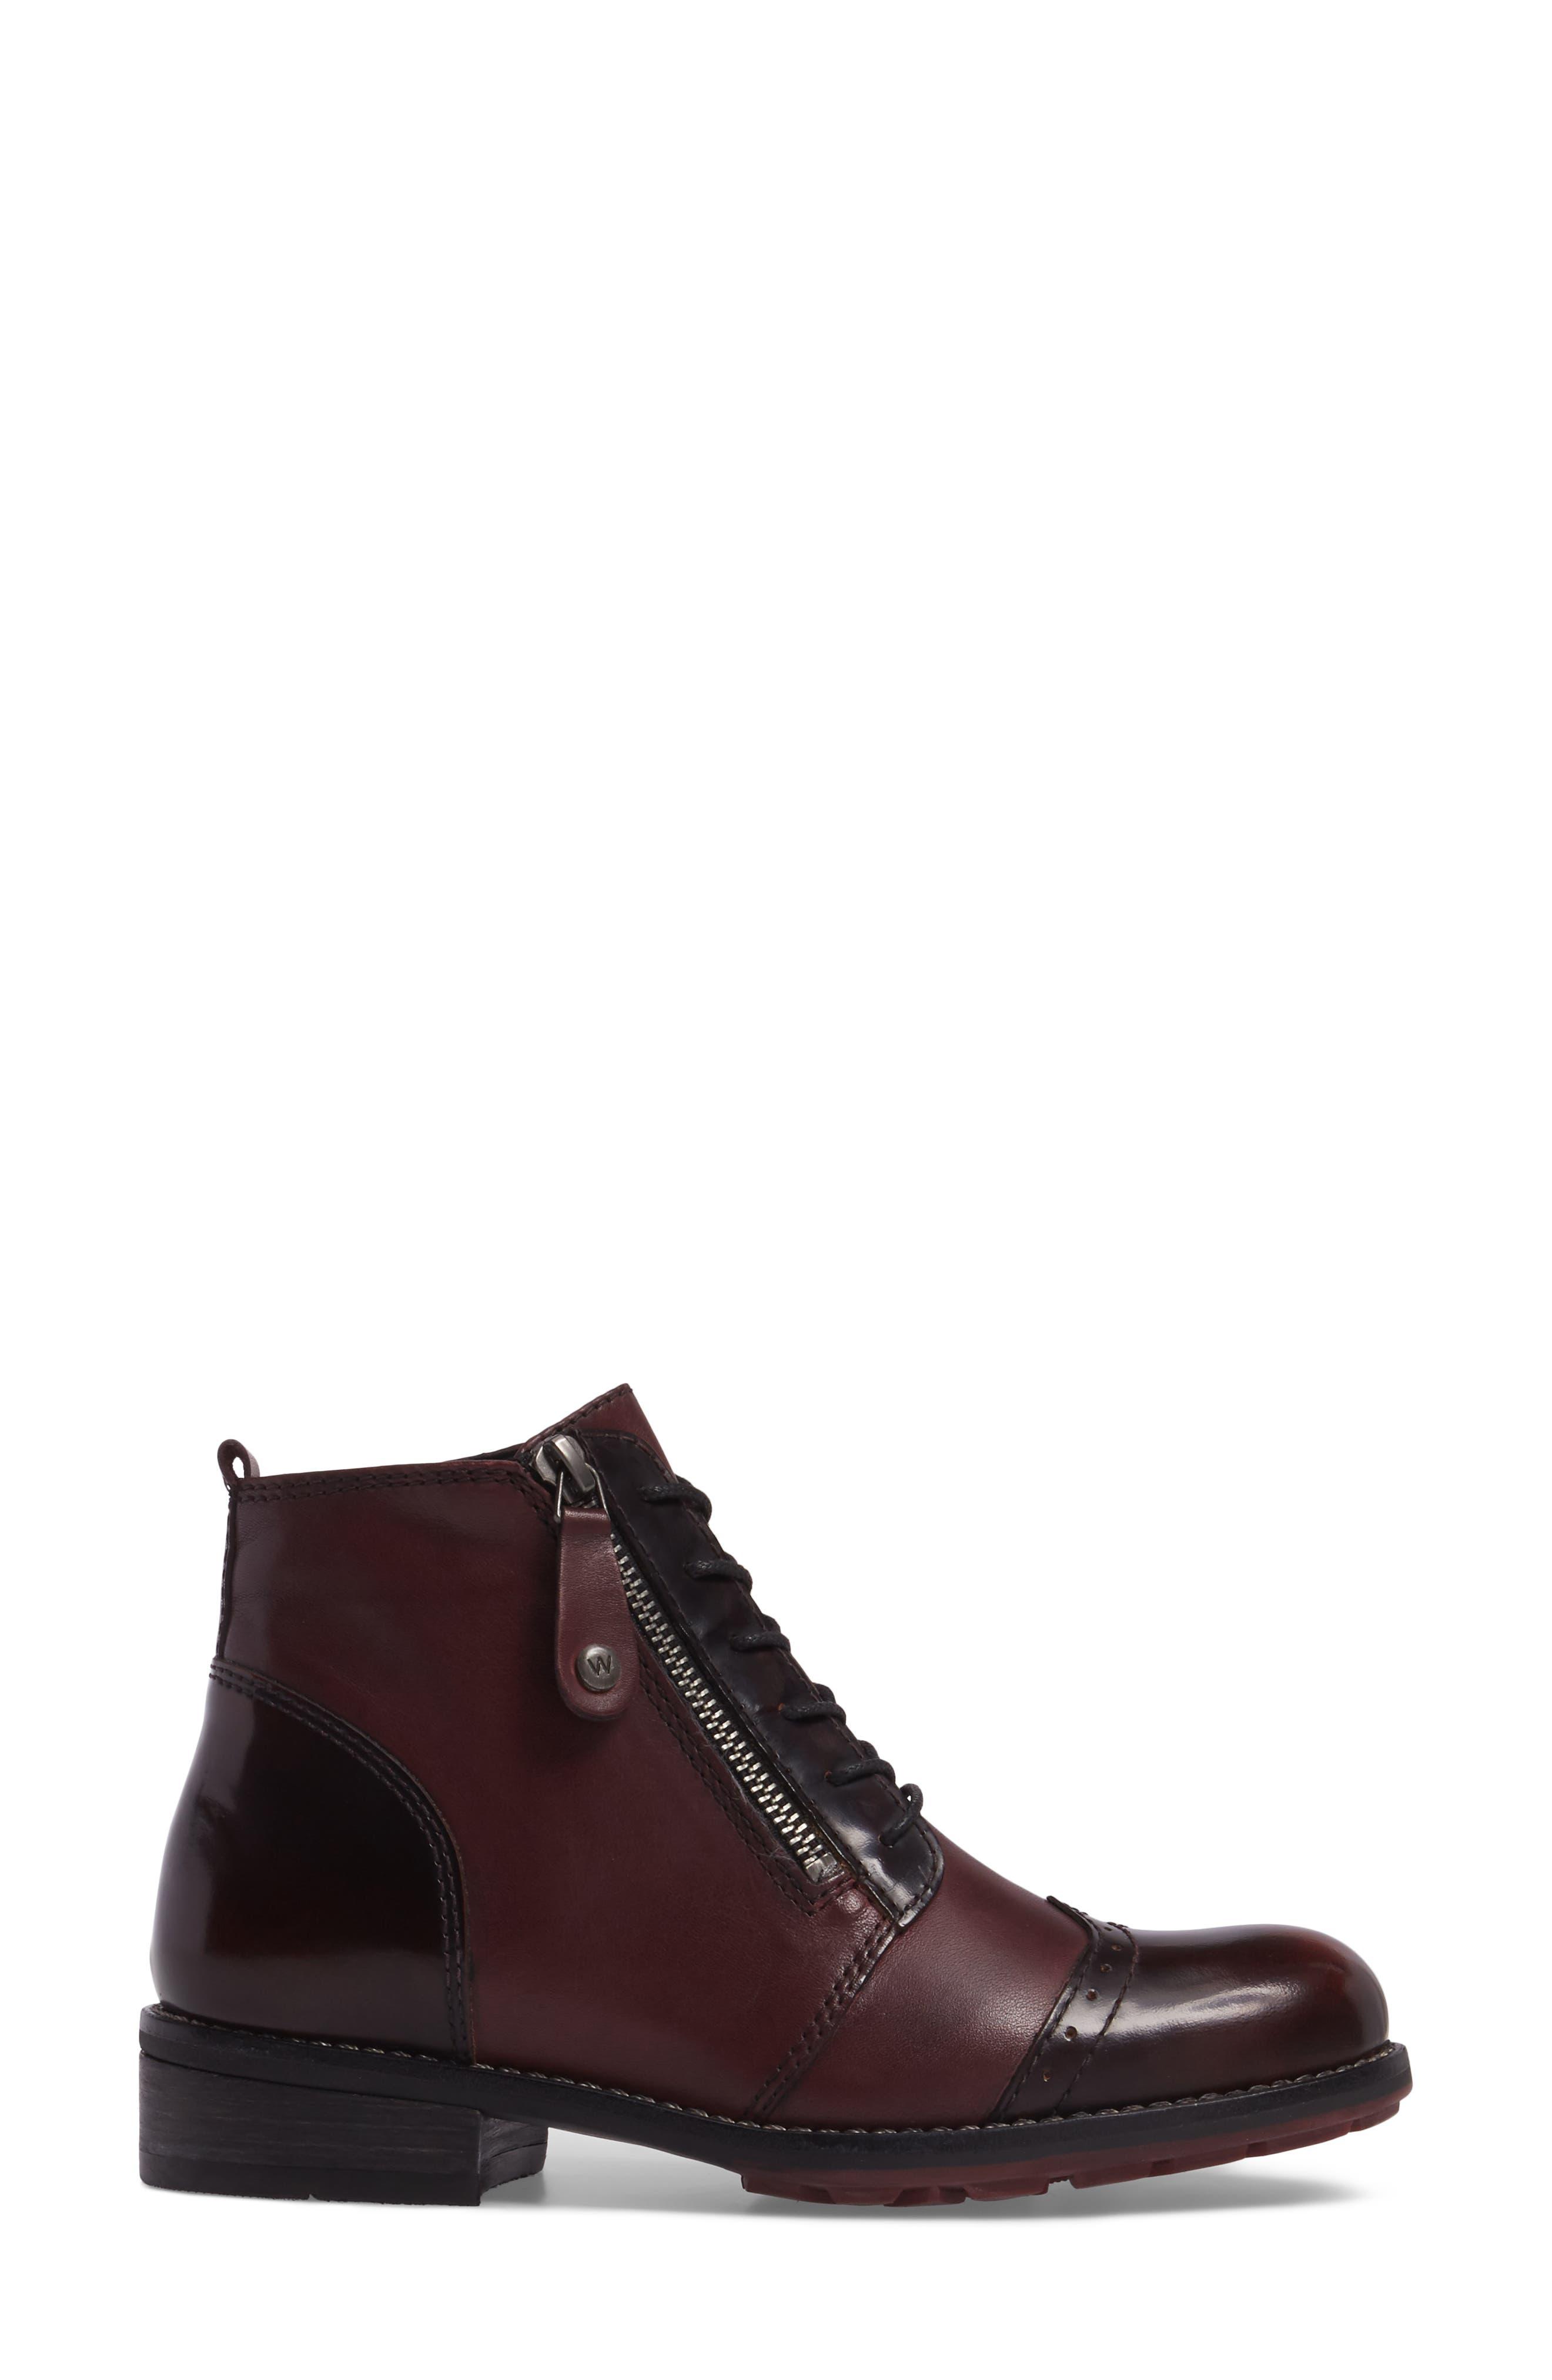 Millstream Boot,                             Alternate thumbnail 3, color,                             Bordo Leather